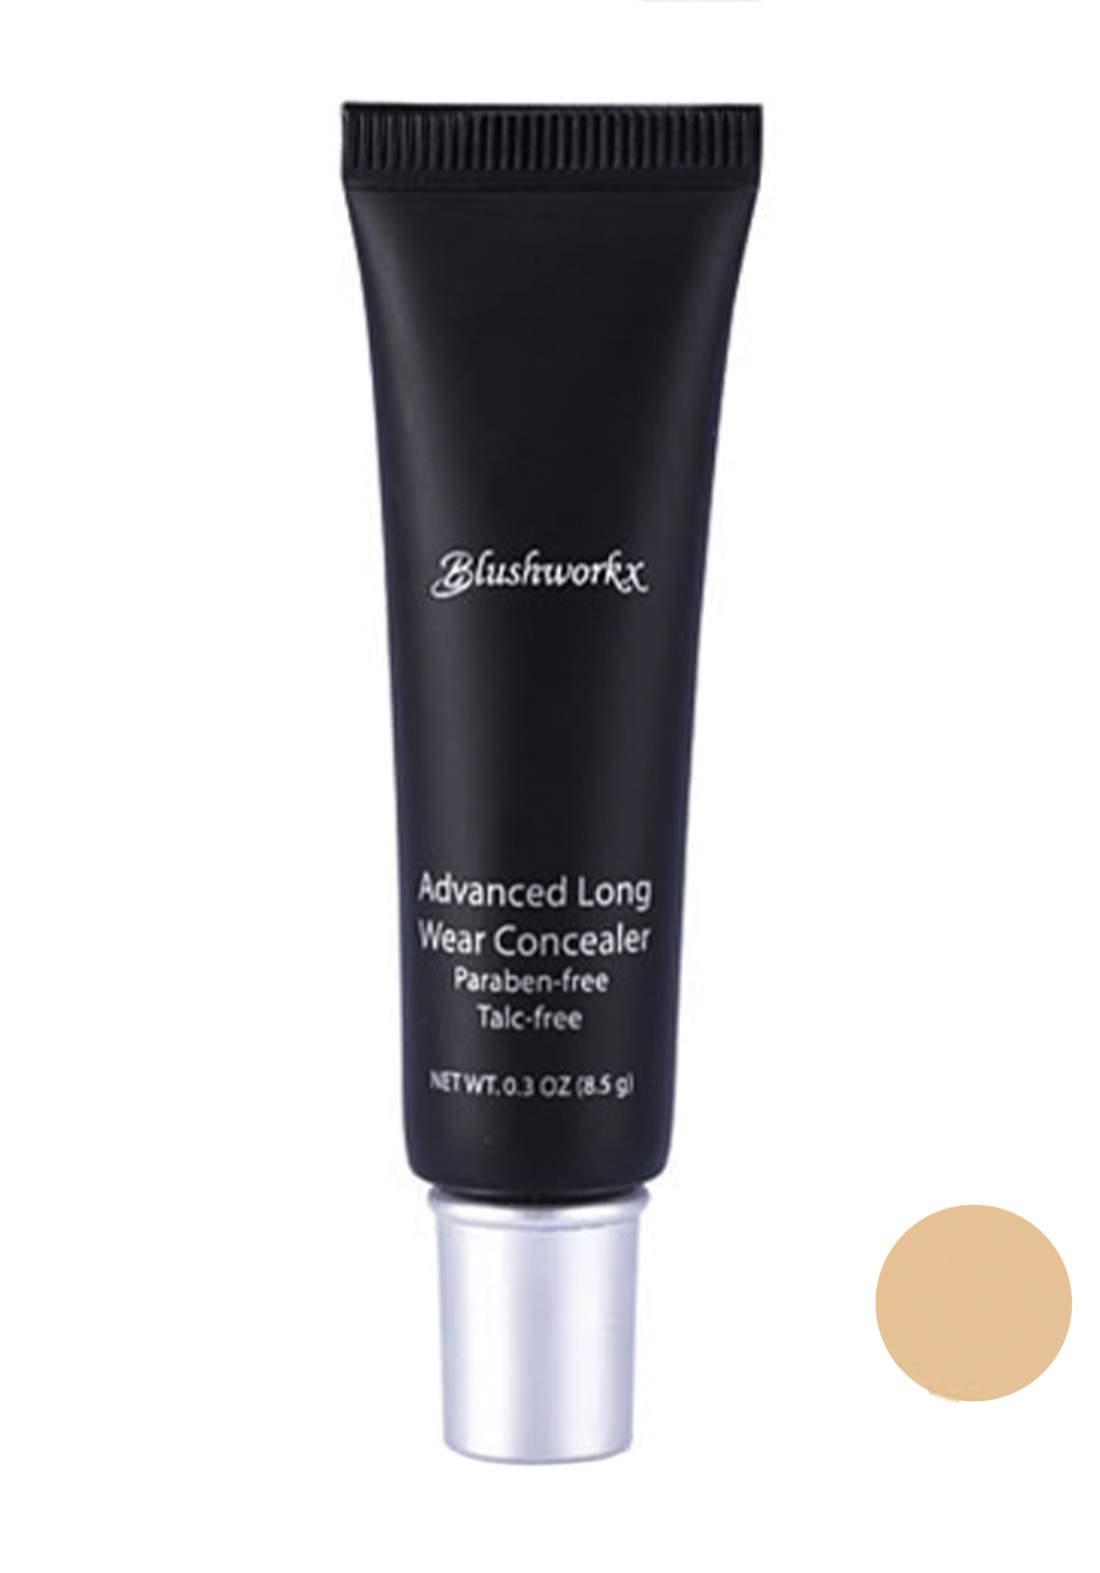 Blushworkx Hollywood Advance Long Wear Concealer 8.5g Extra Light كونسيلر